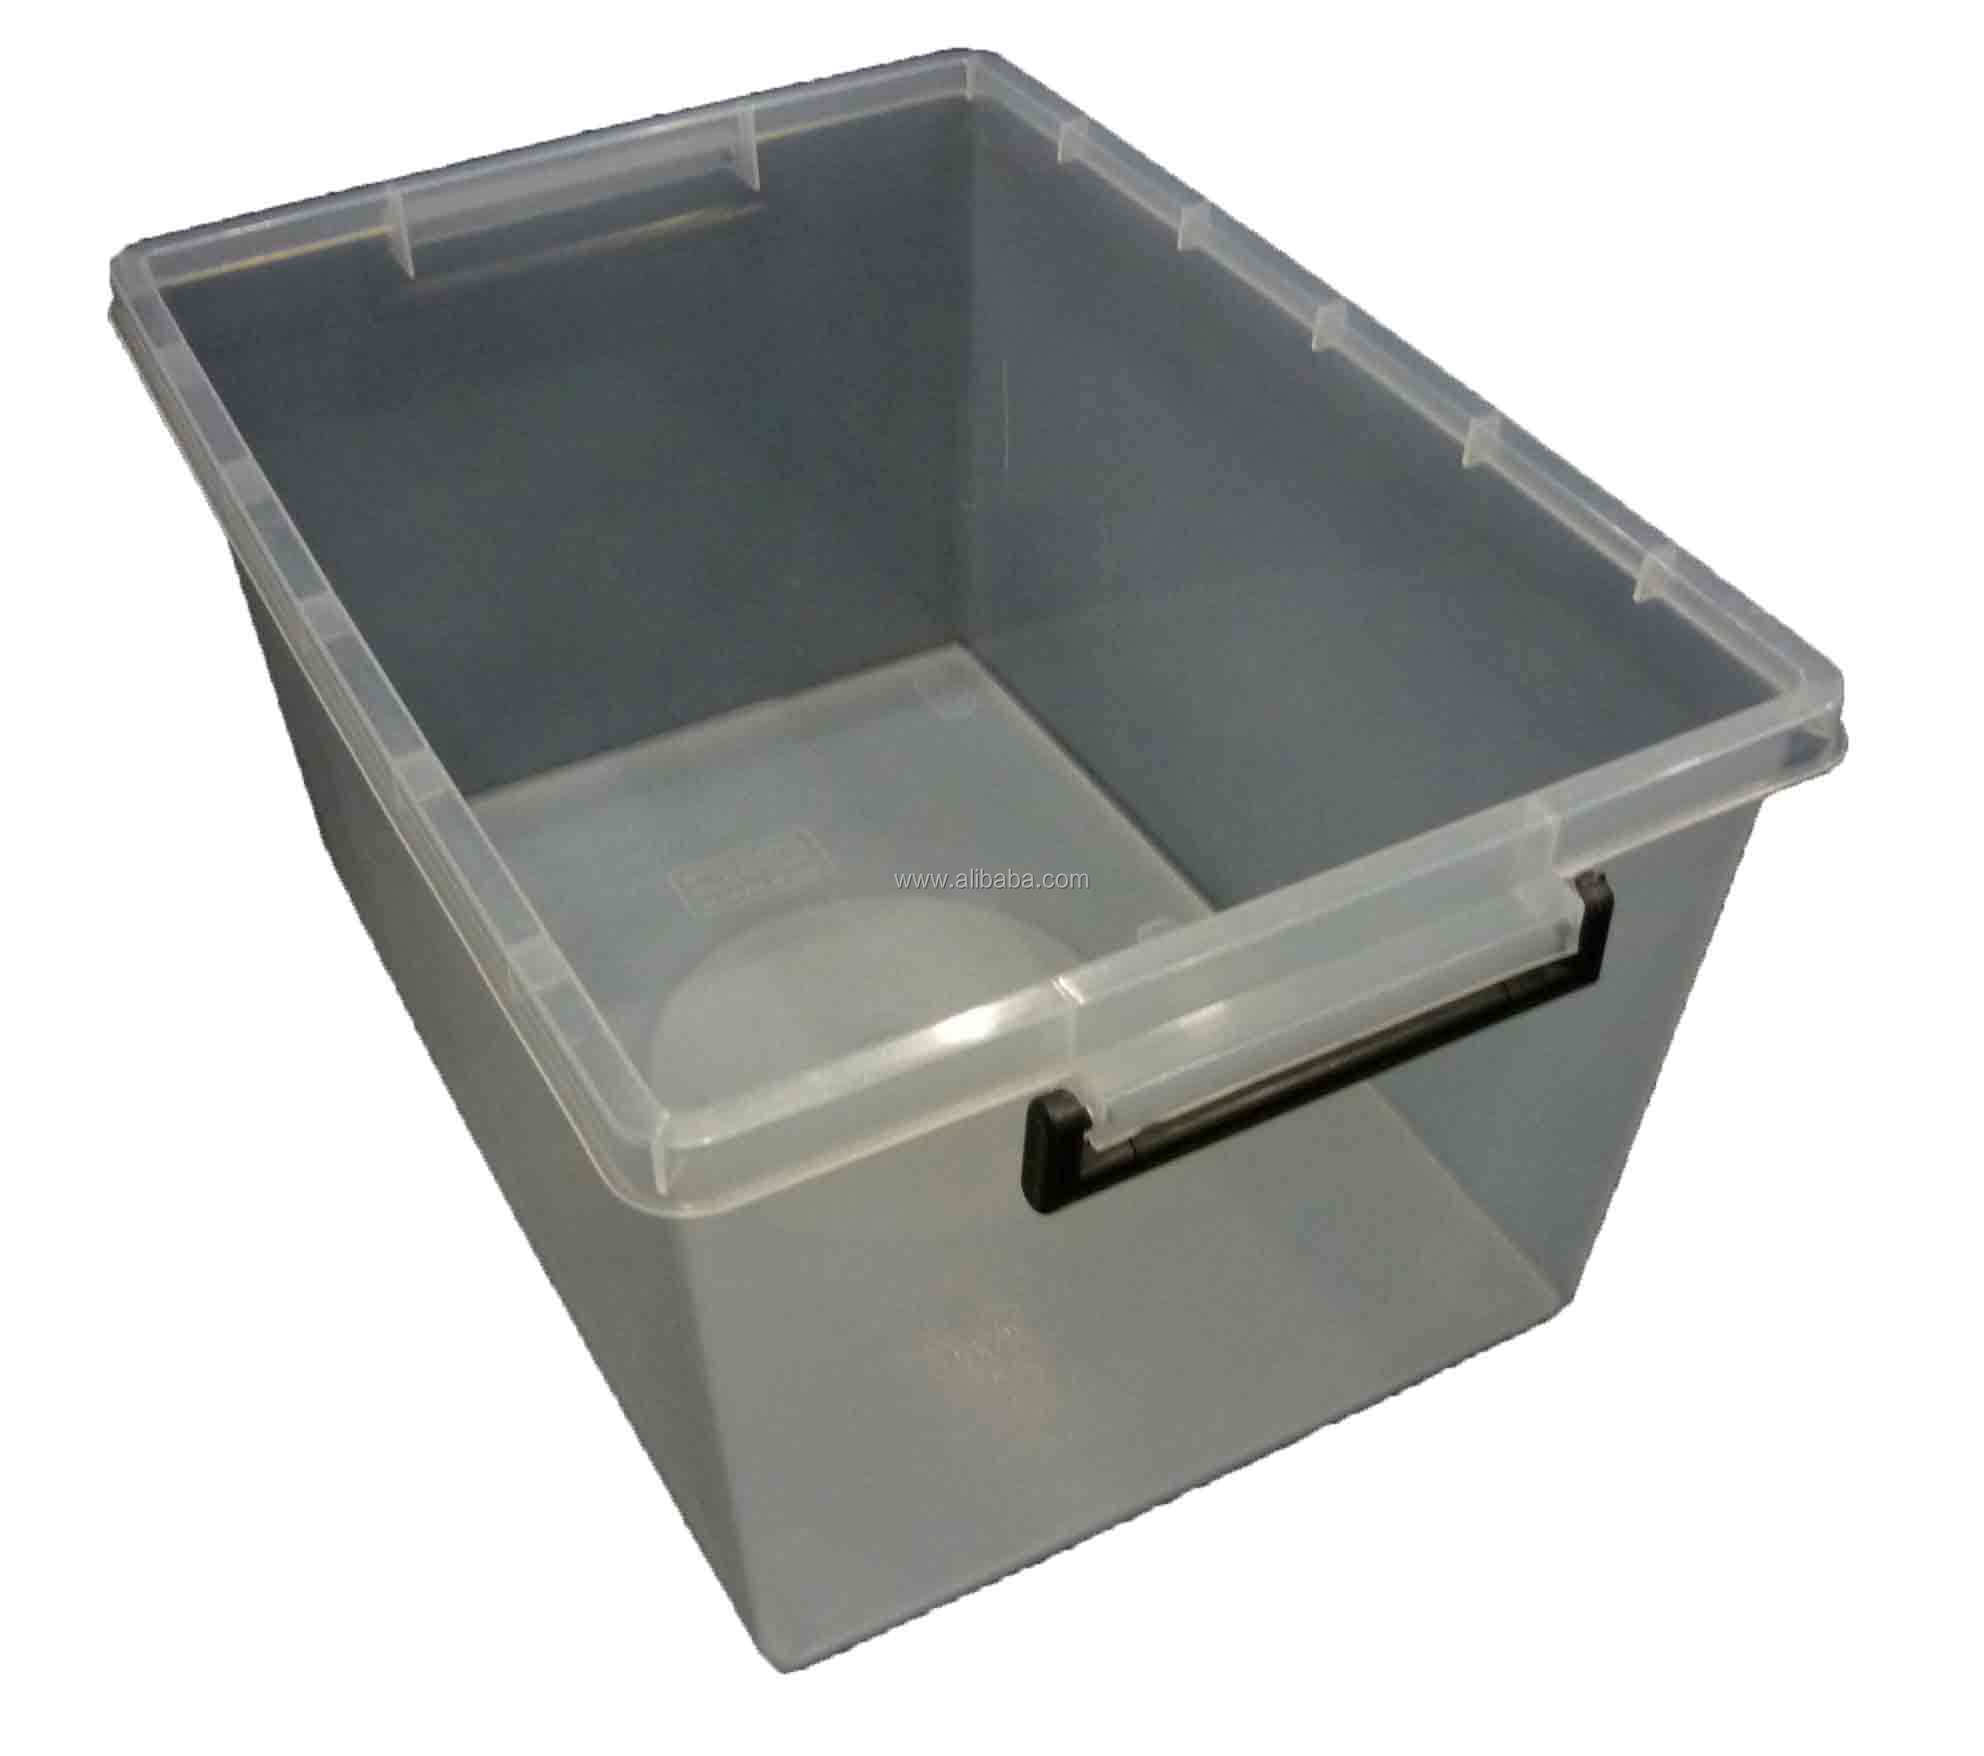 45lt Plastic Storage Box Boxes Tub Tubs Container